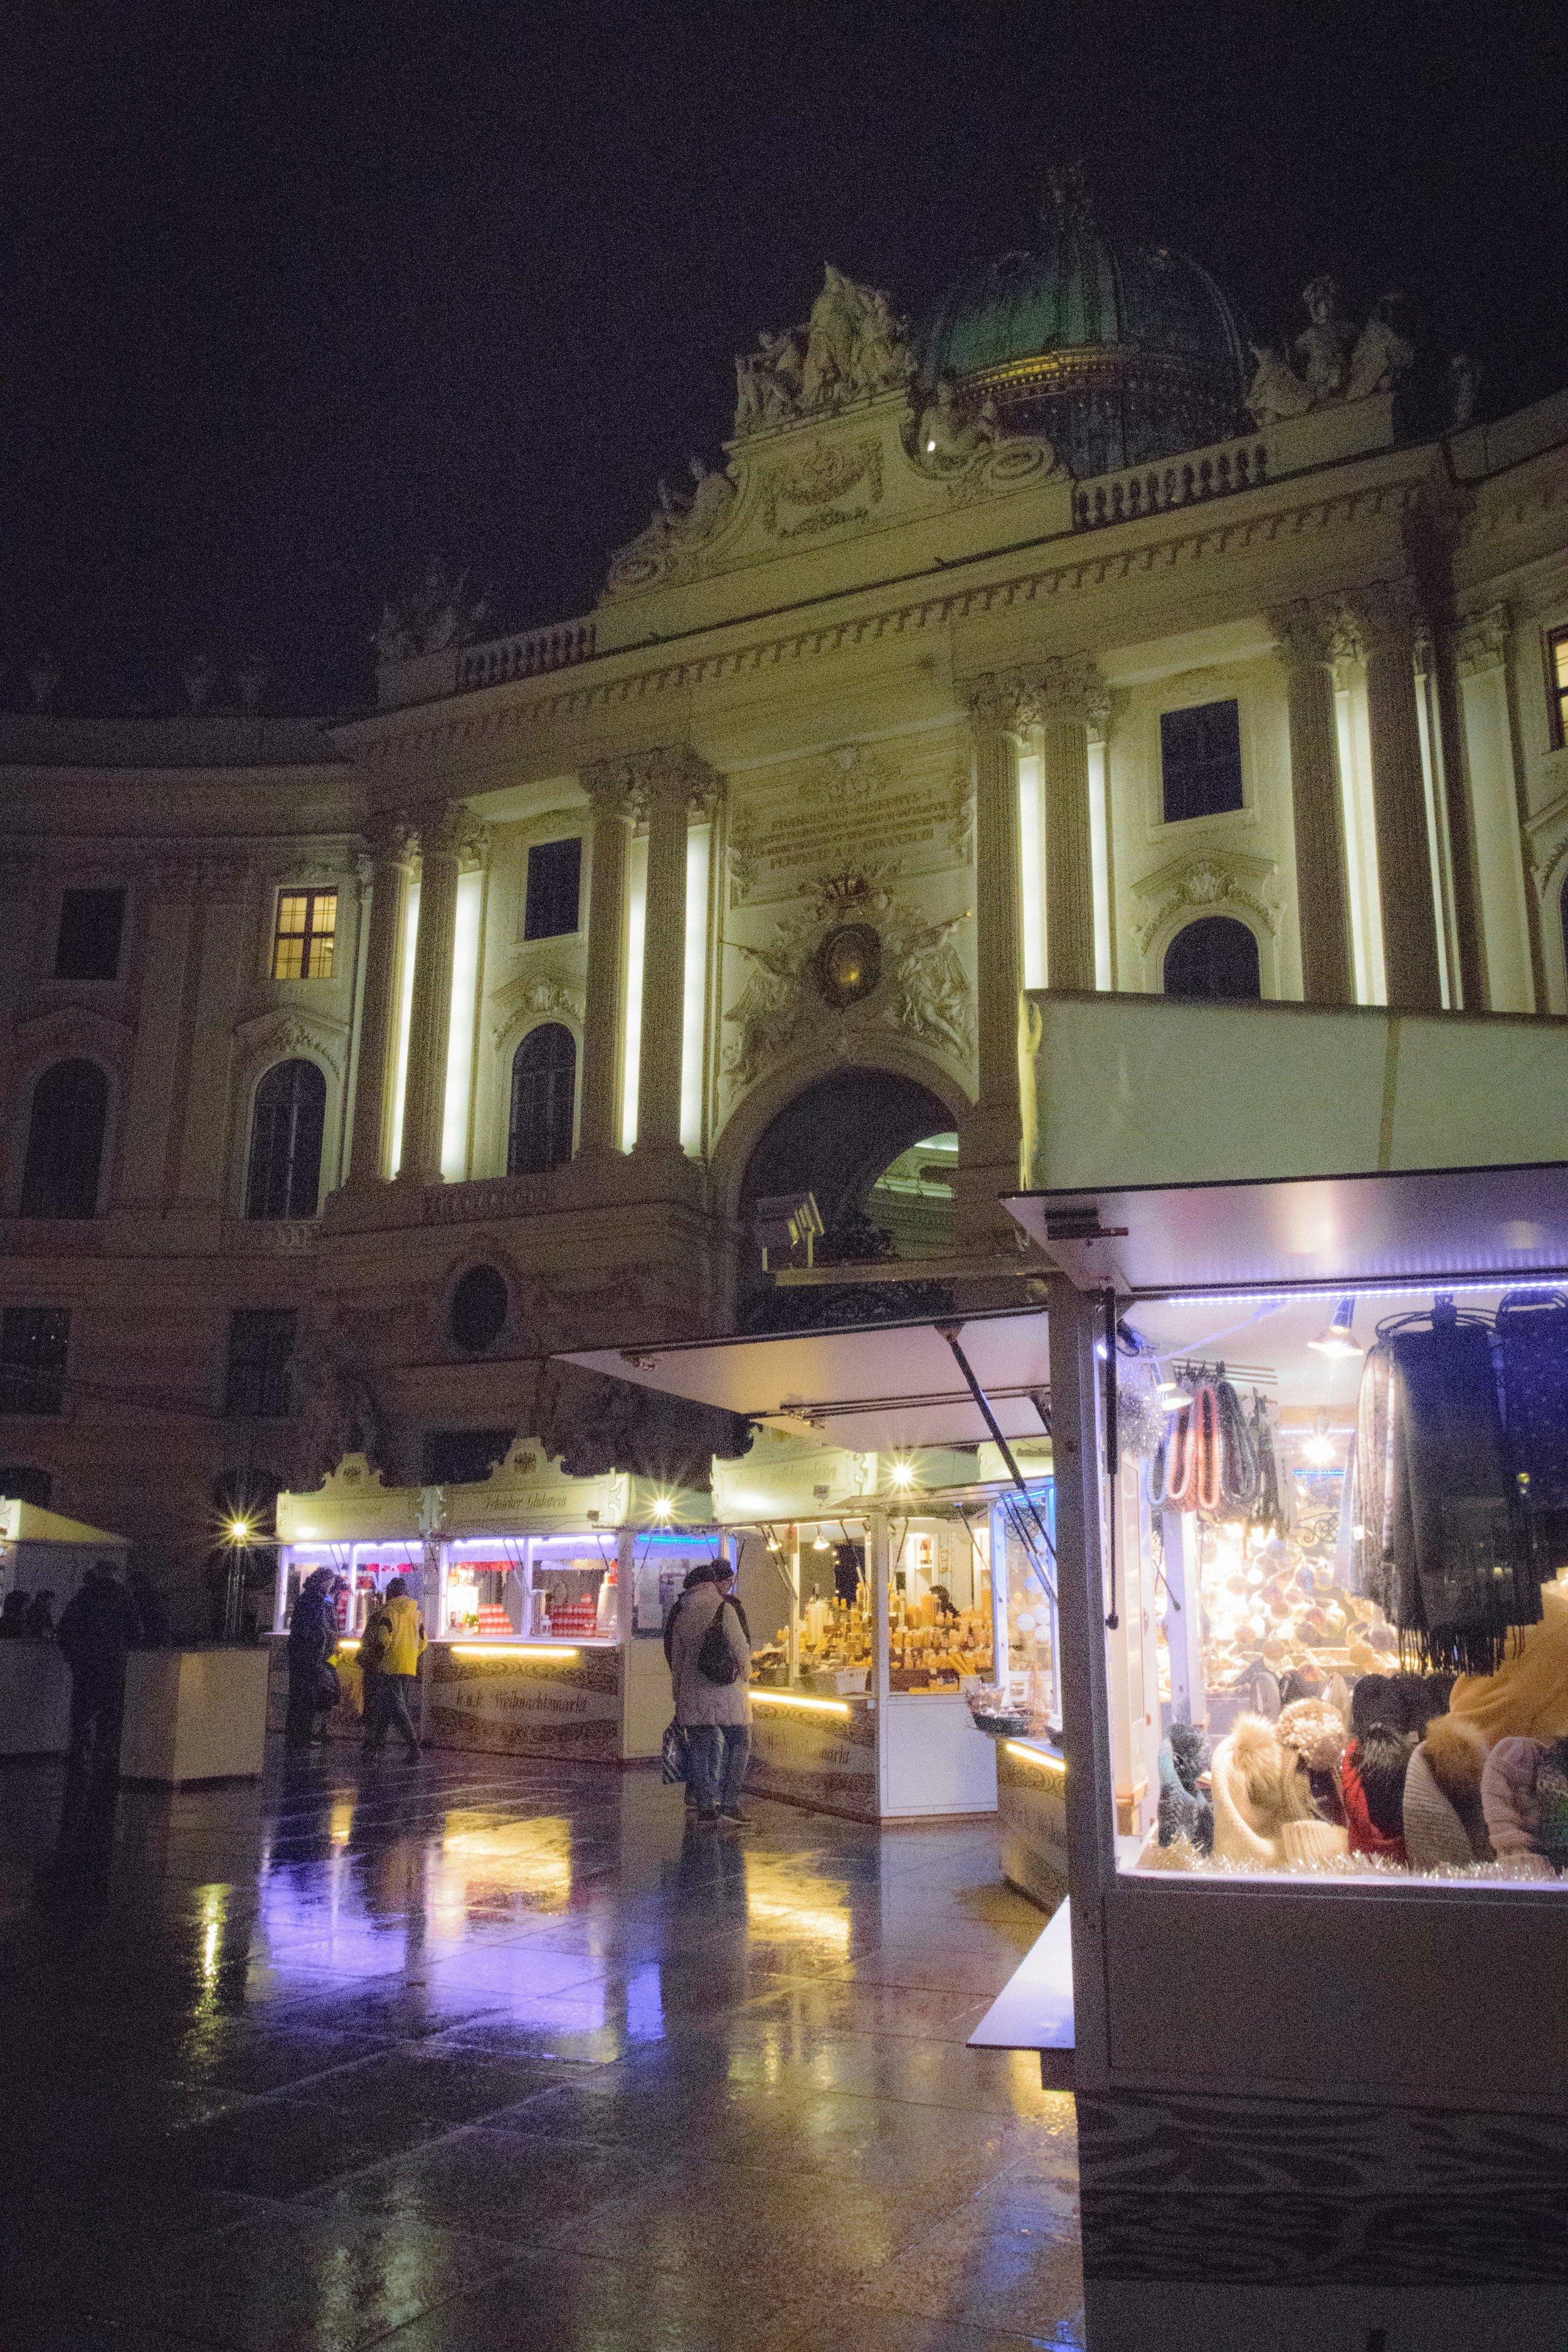 outside of the Hofburg Palace